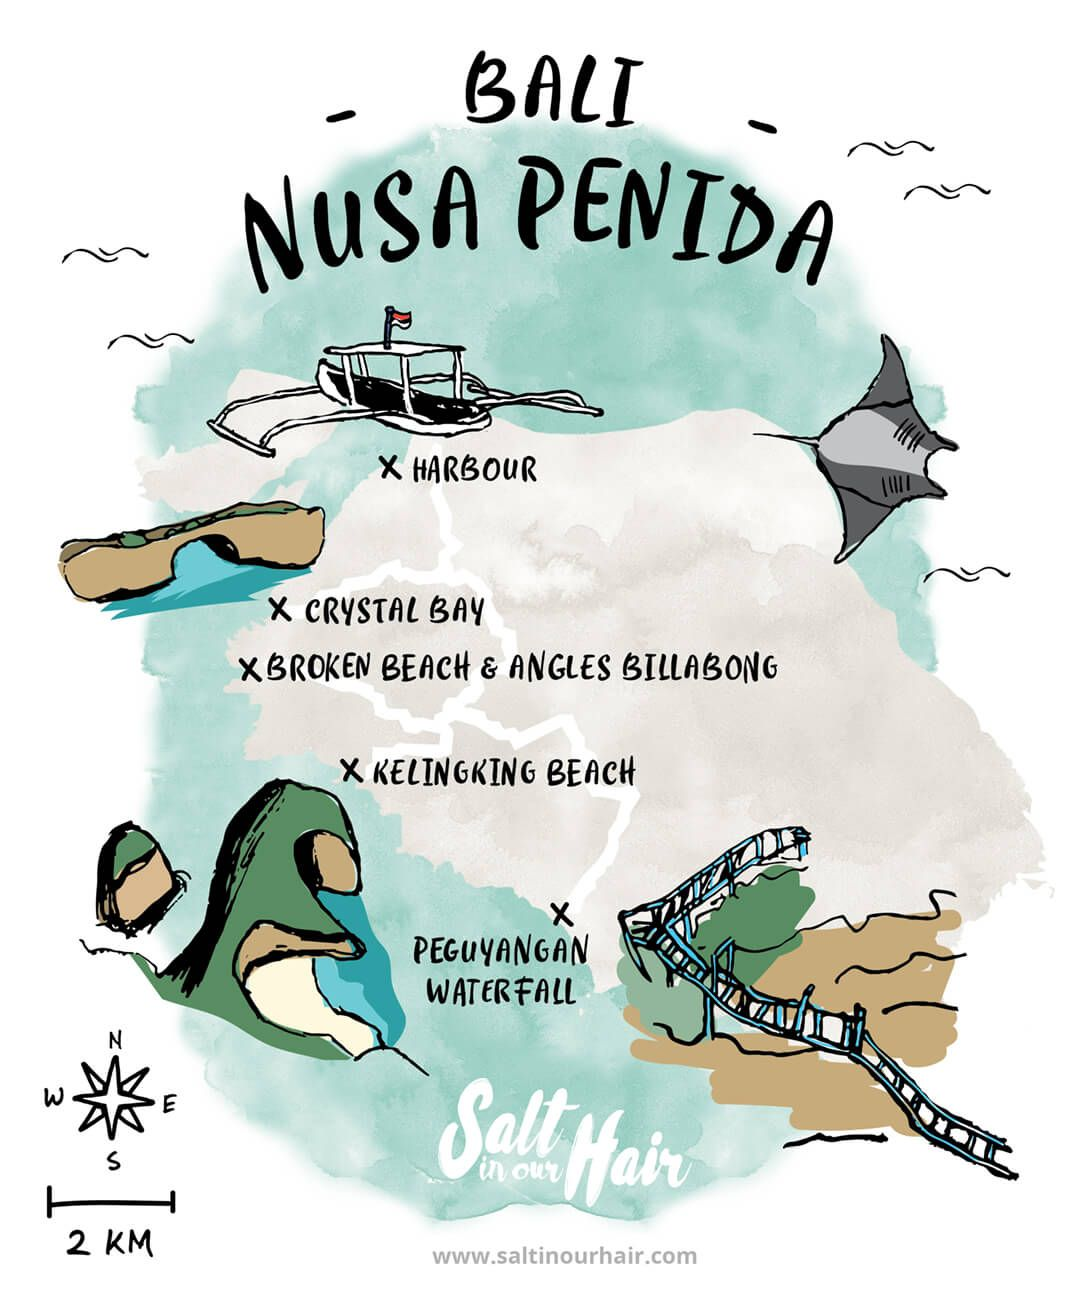 Nusa Penida Tour Things You Must See On A Nusa Penida Tour